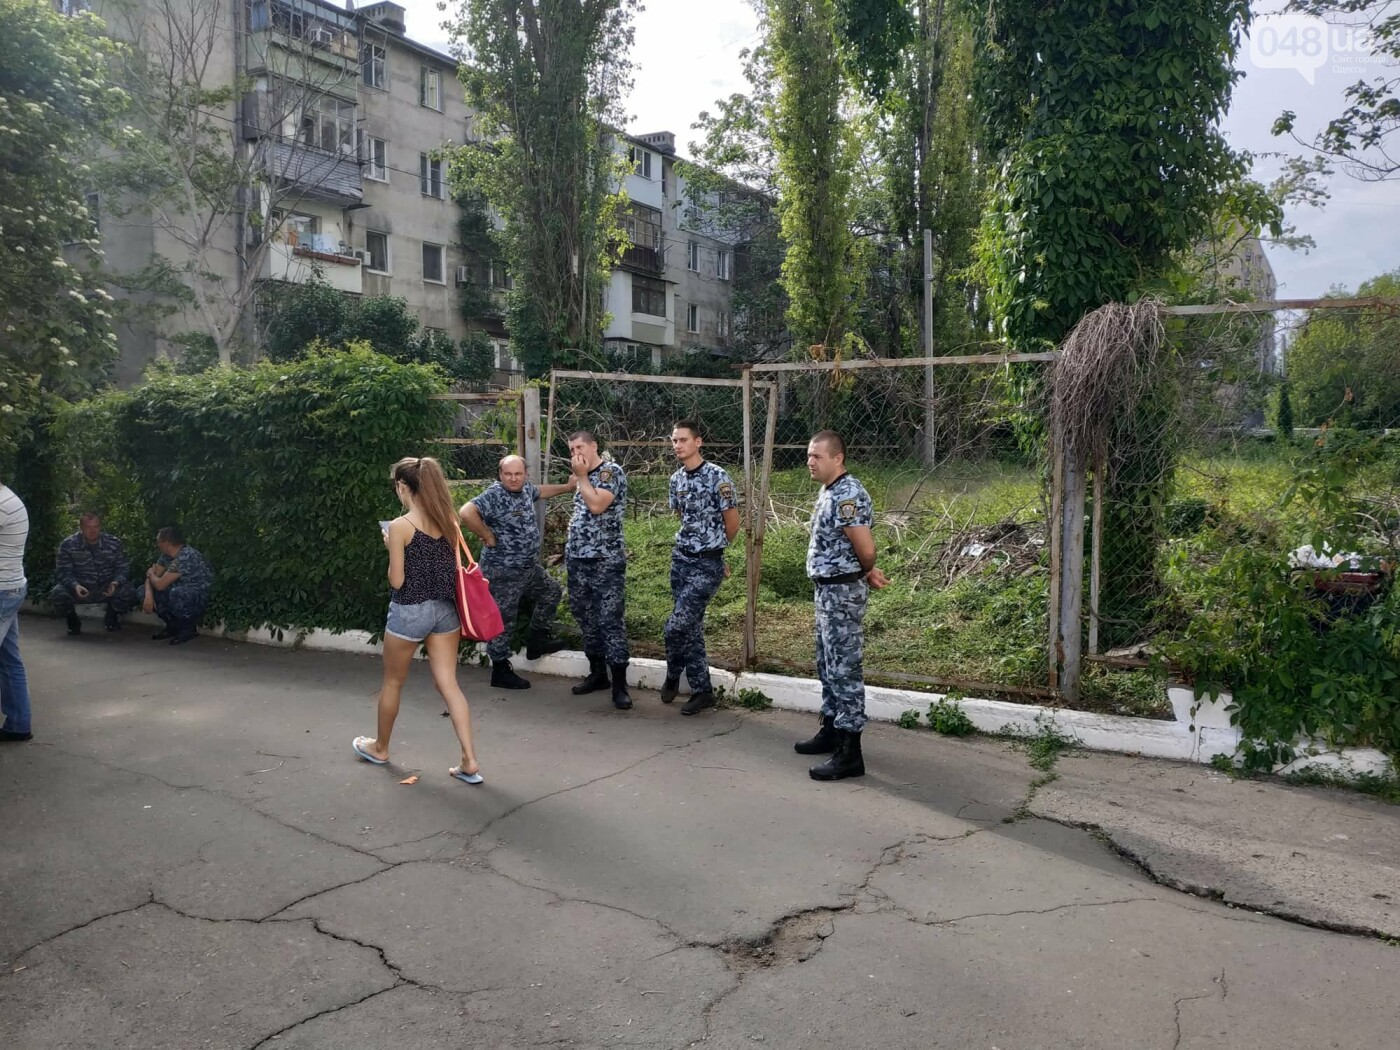 Одесский университет заявил о рейдерском захвате земли: без драки не обошлось, - ФОТО, фото-5, Фото: Александр Жирносенко